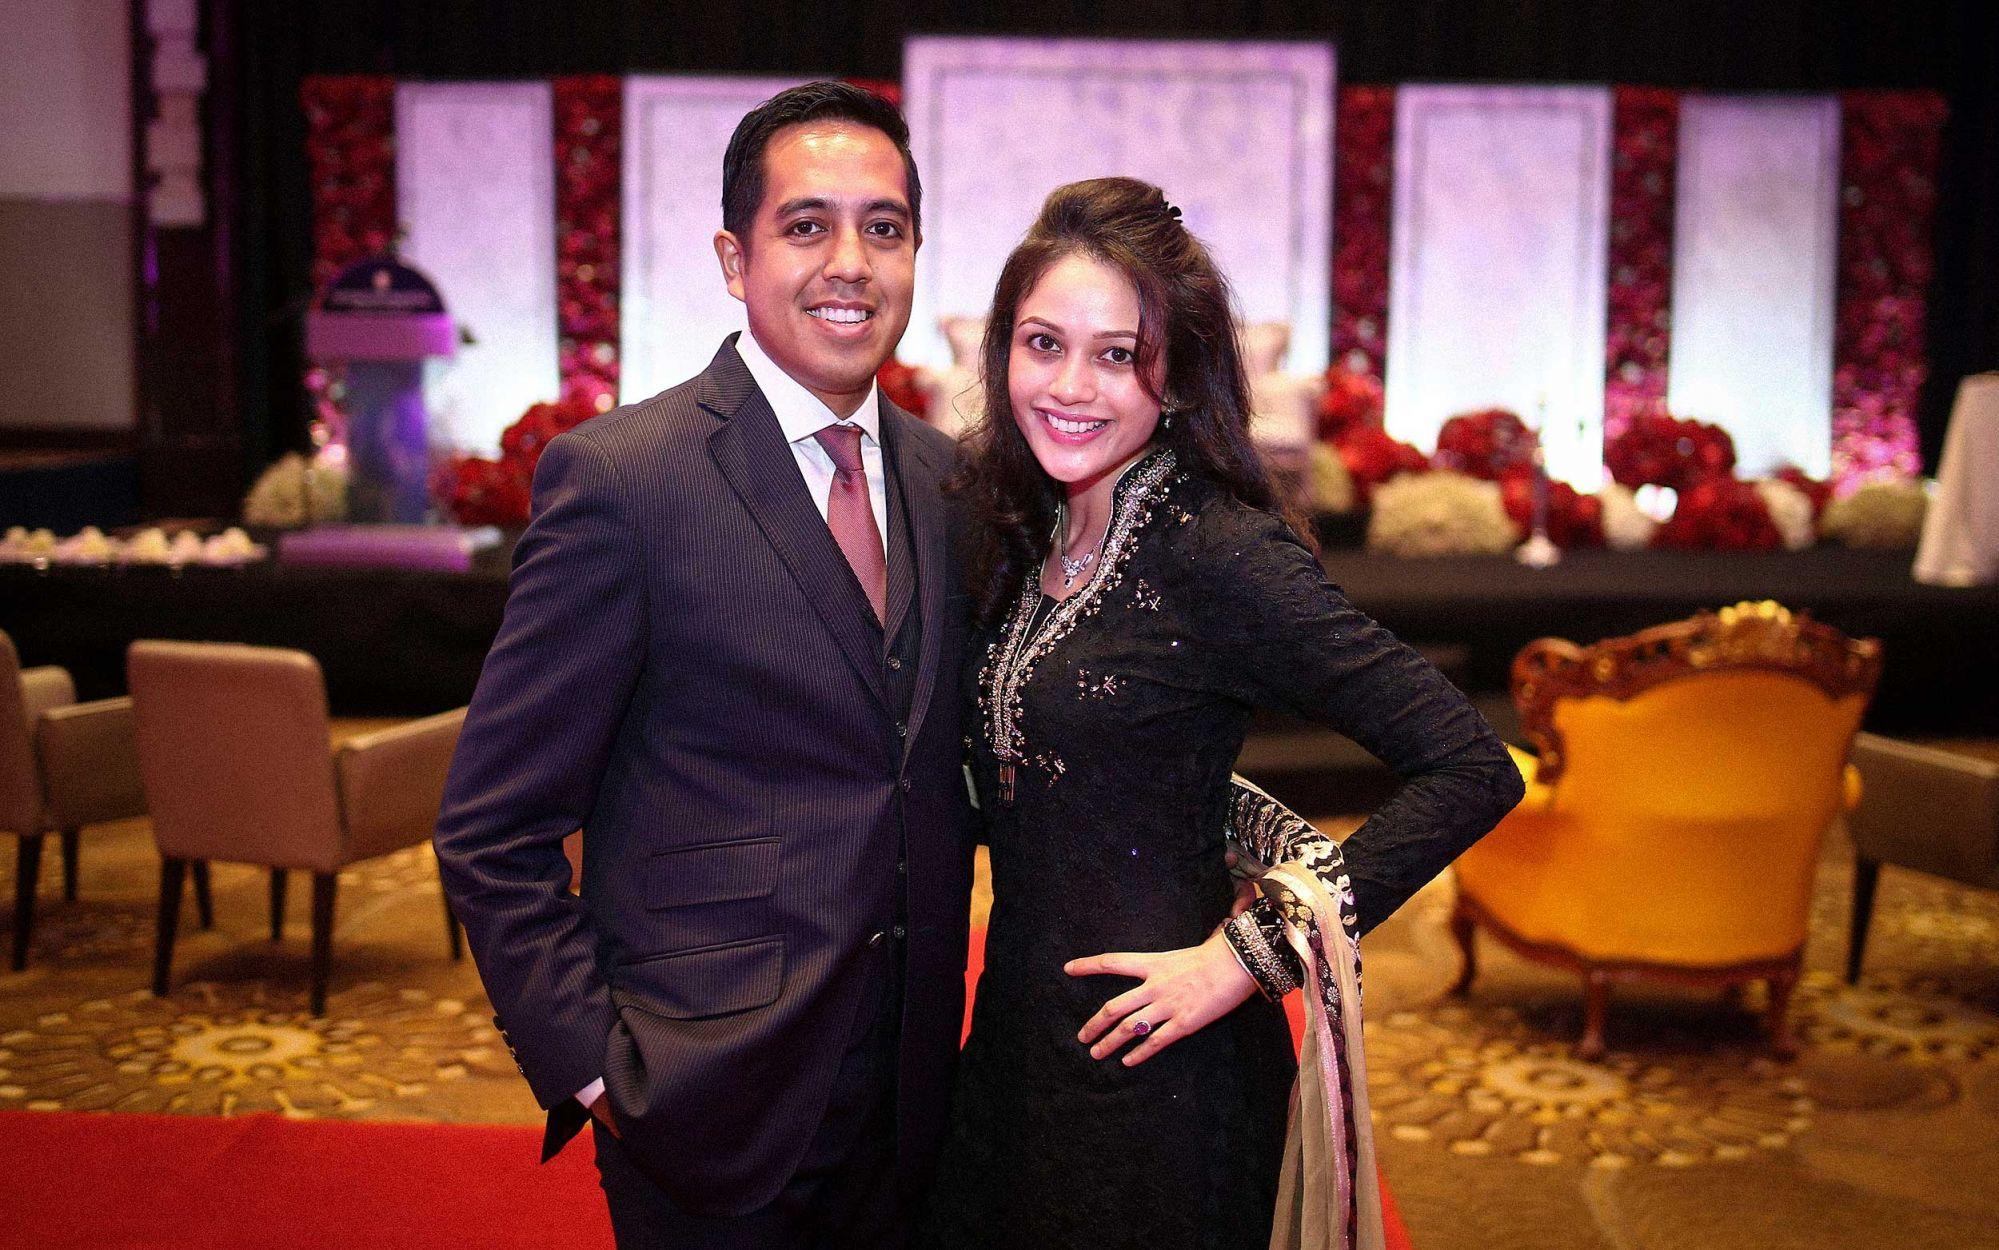 Nik Harris and Nataliah Md Noor